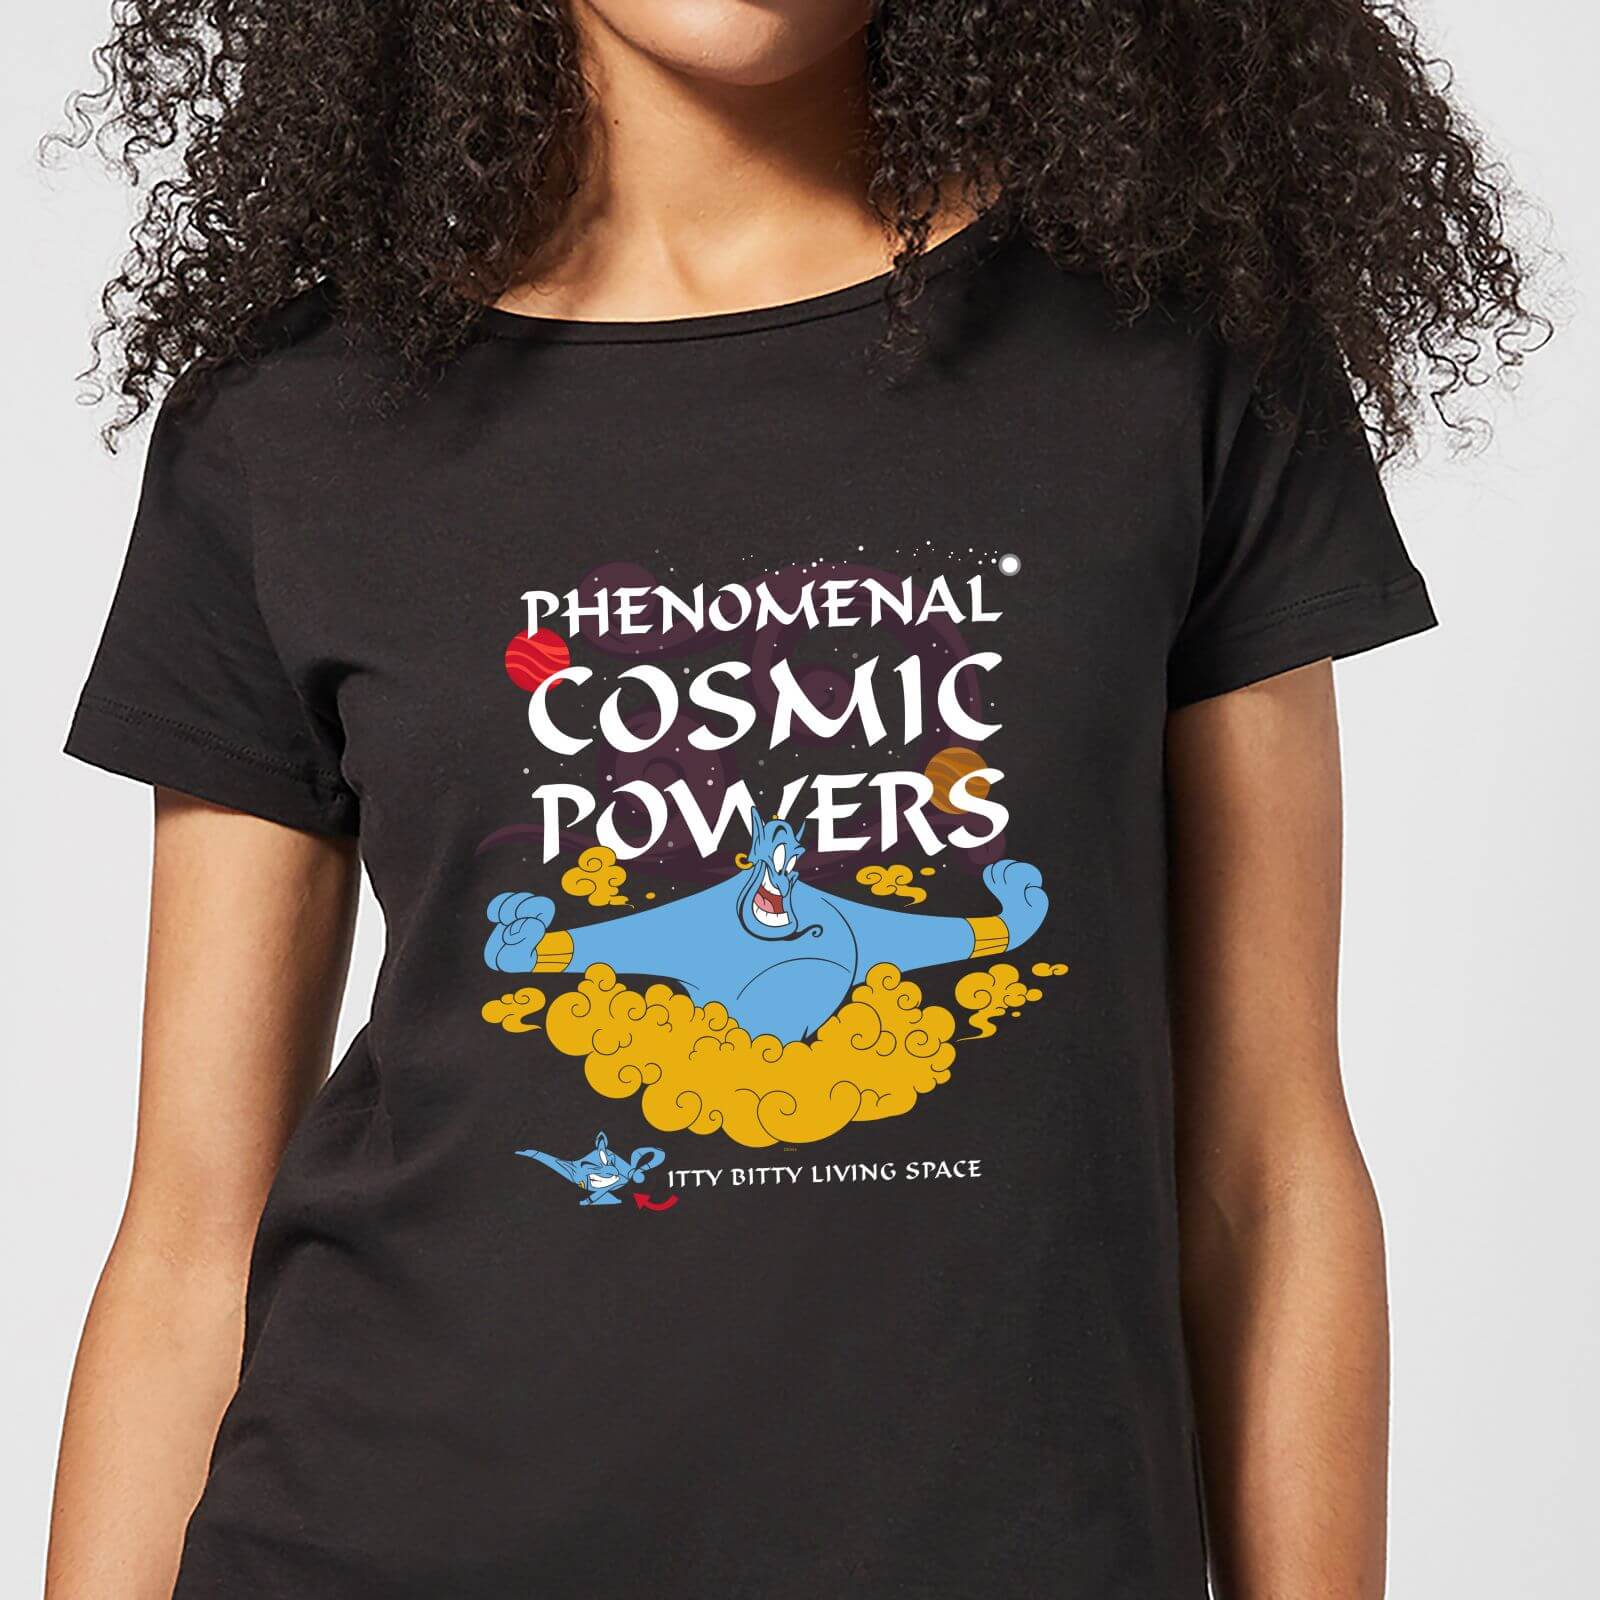 Disney Disney Aladdin Phenomenal Cosmic Power Women's T-Shirt - Black - 3XL - Black